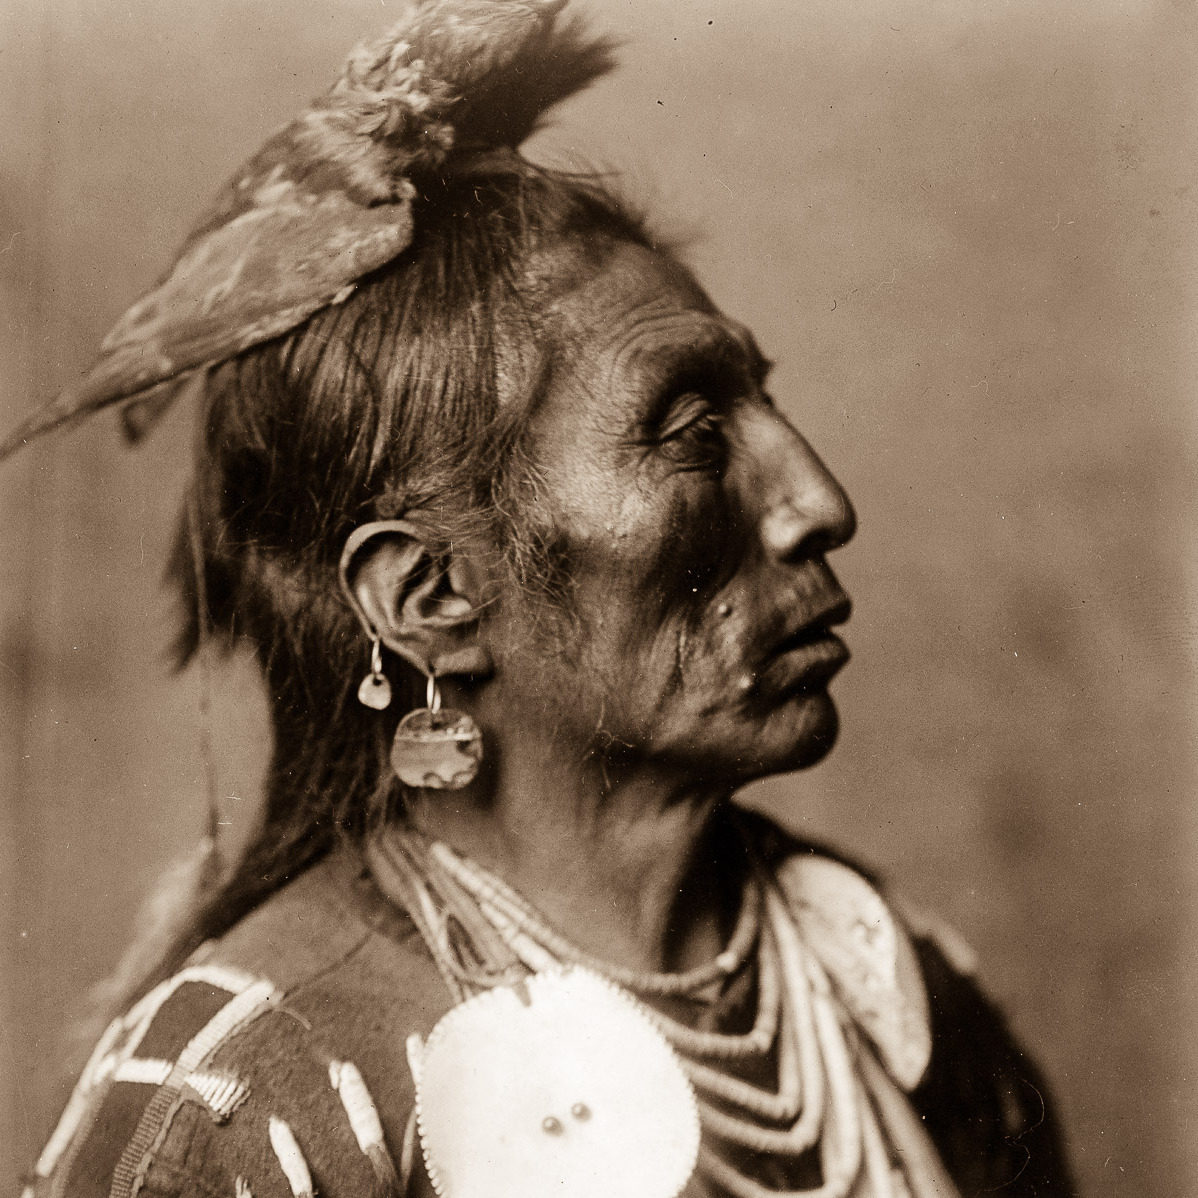 фото племен индейцев америки просто водить